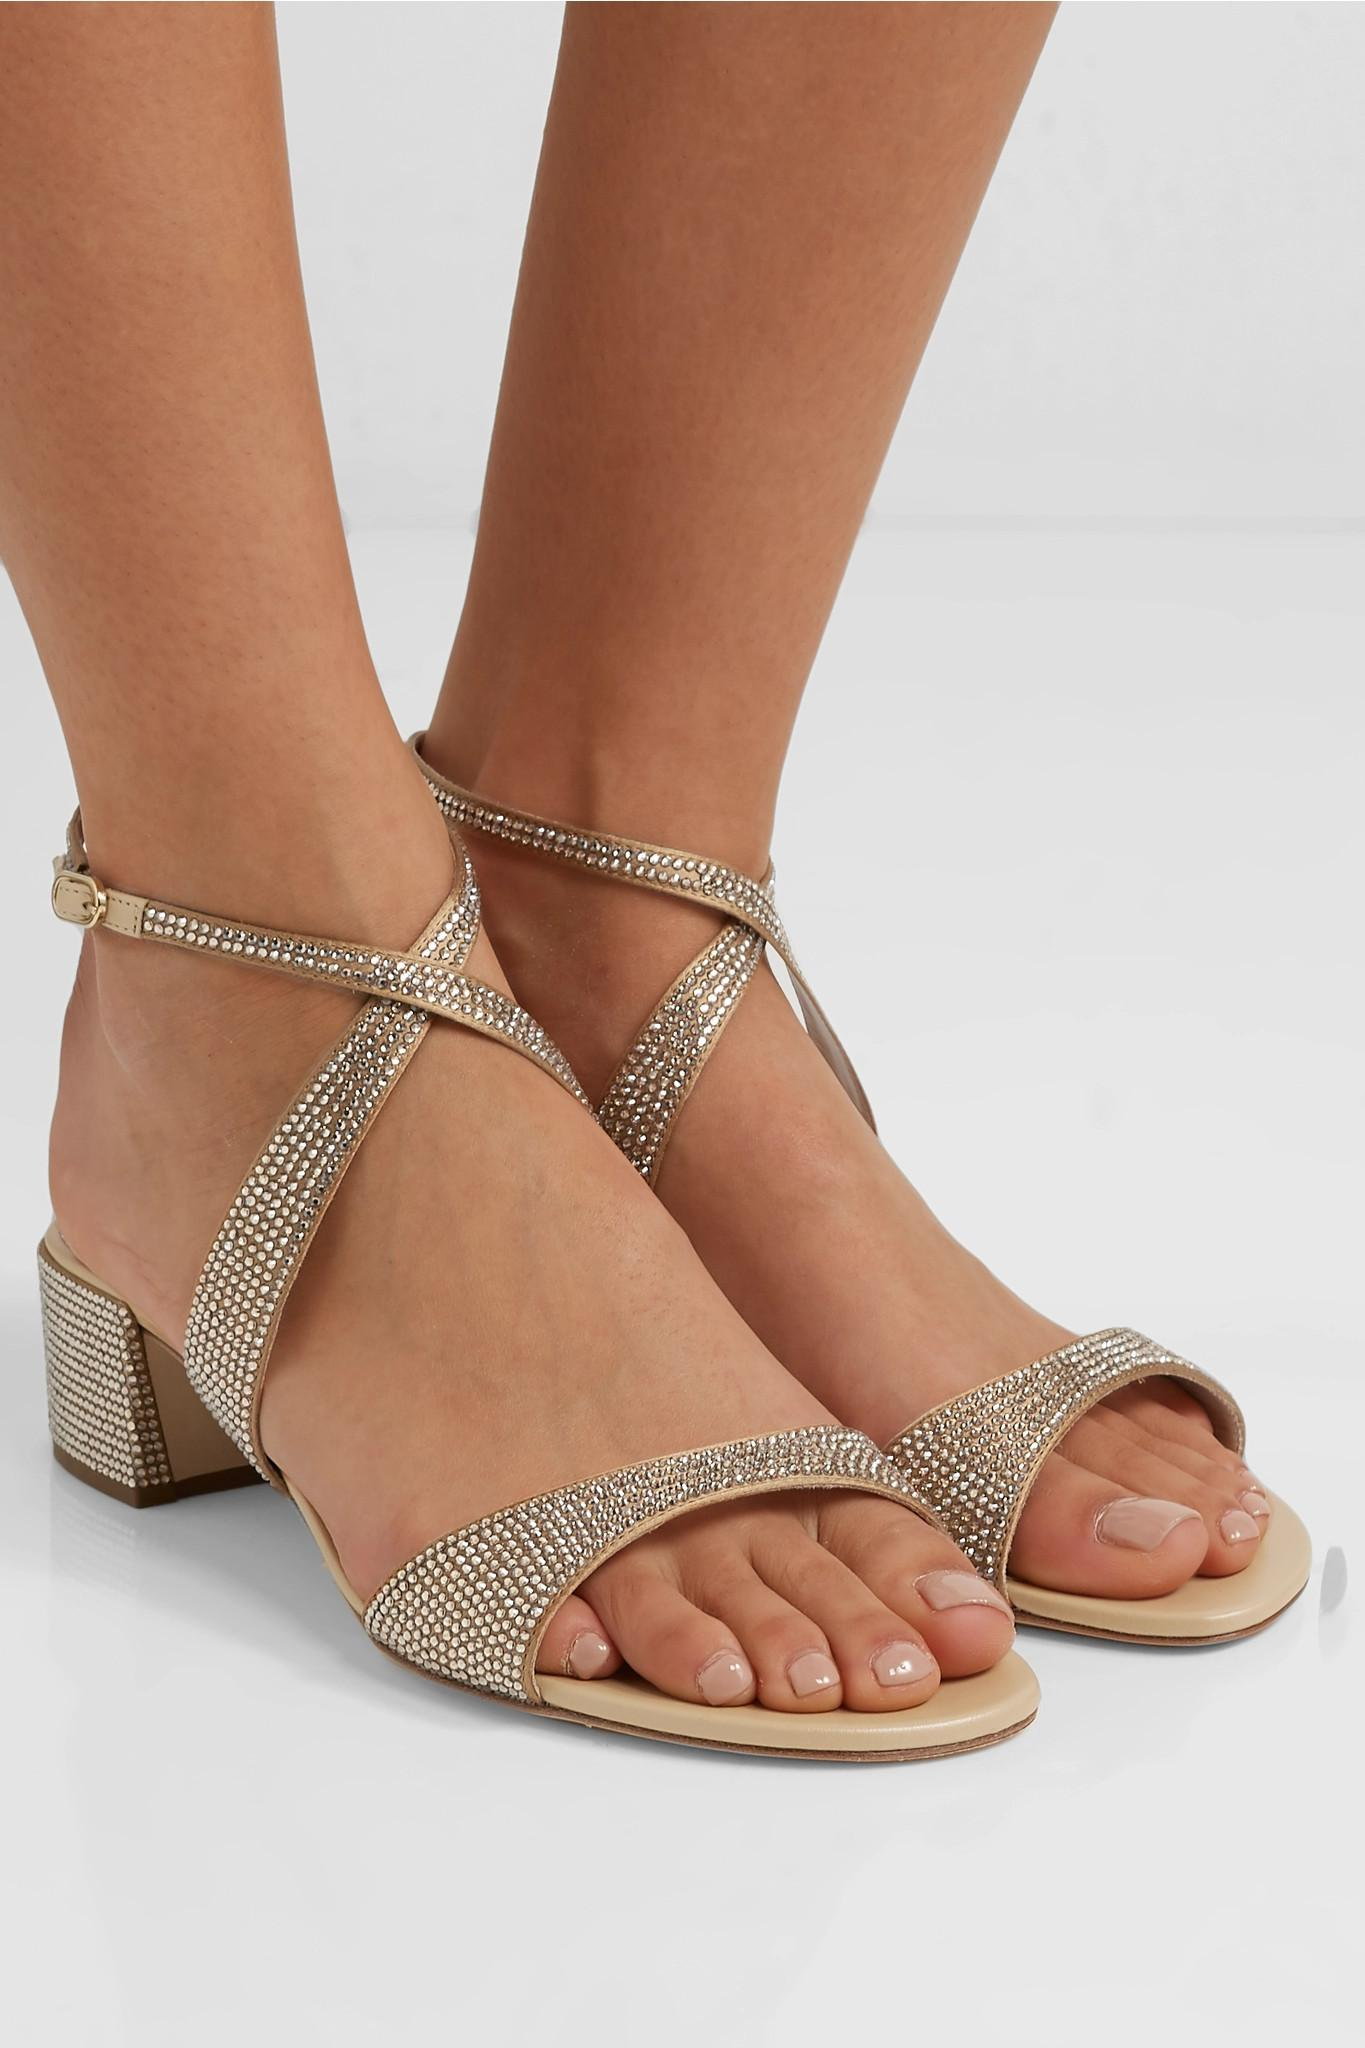 4b1540e153e74f Rene Caovilla - Krisabrita Crystal-embellished Metallic Leather Sandals -  Lyst. View fullscreen